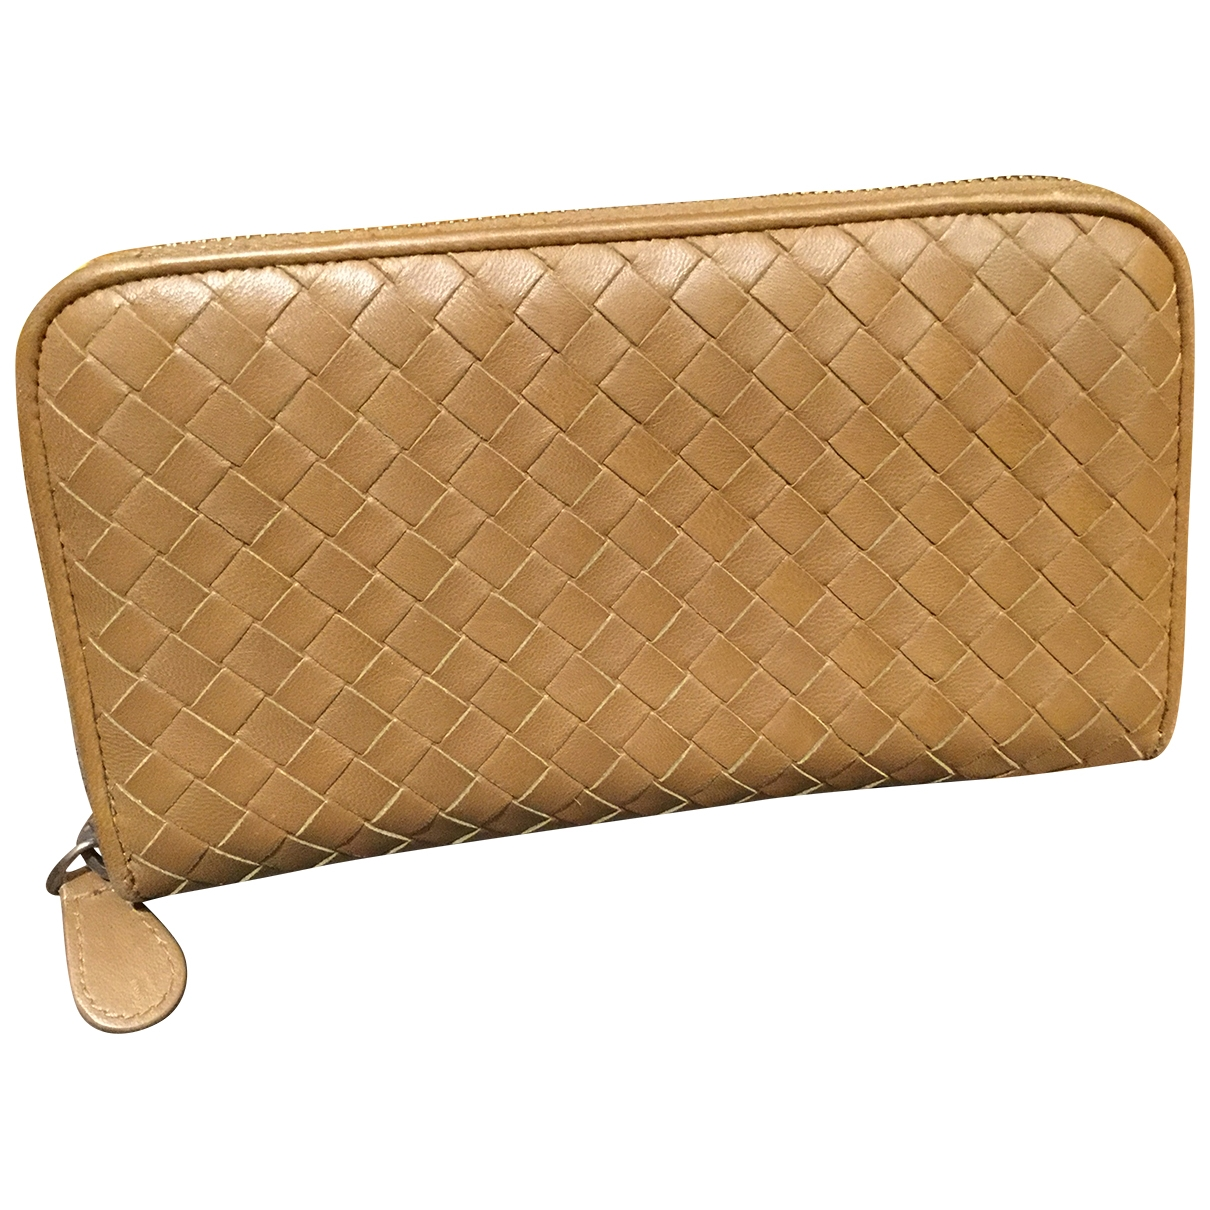 Bottega Veneta - Portefeuille Intrecciato pour femme en cuir - marron